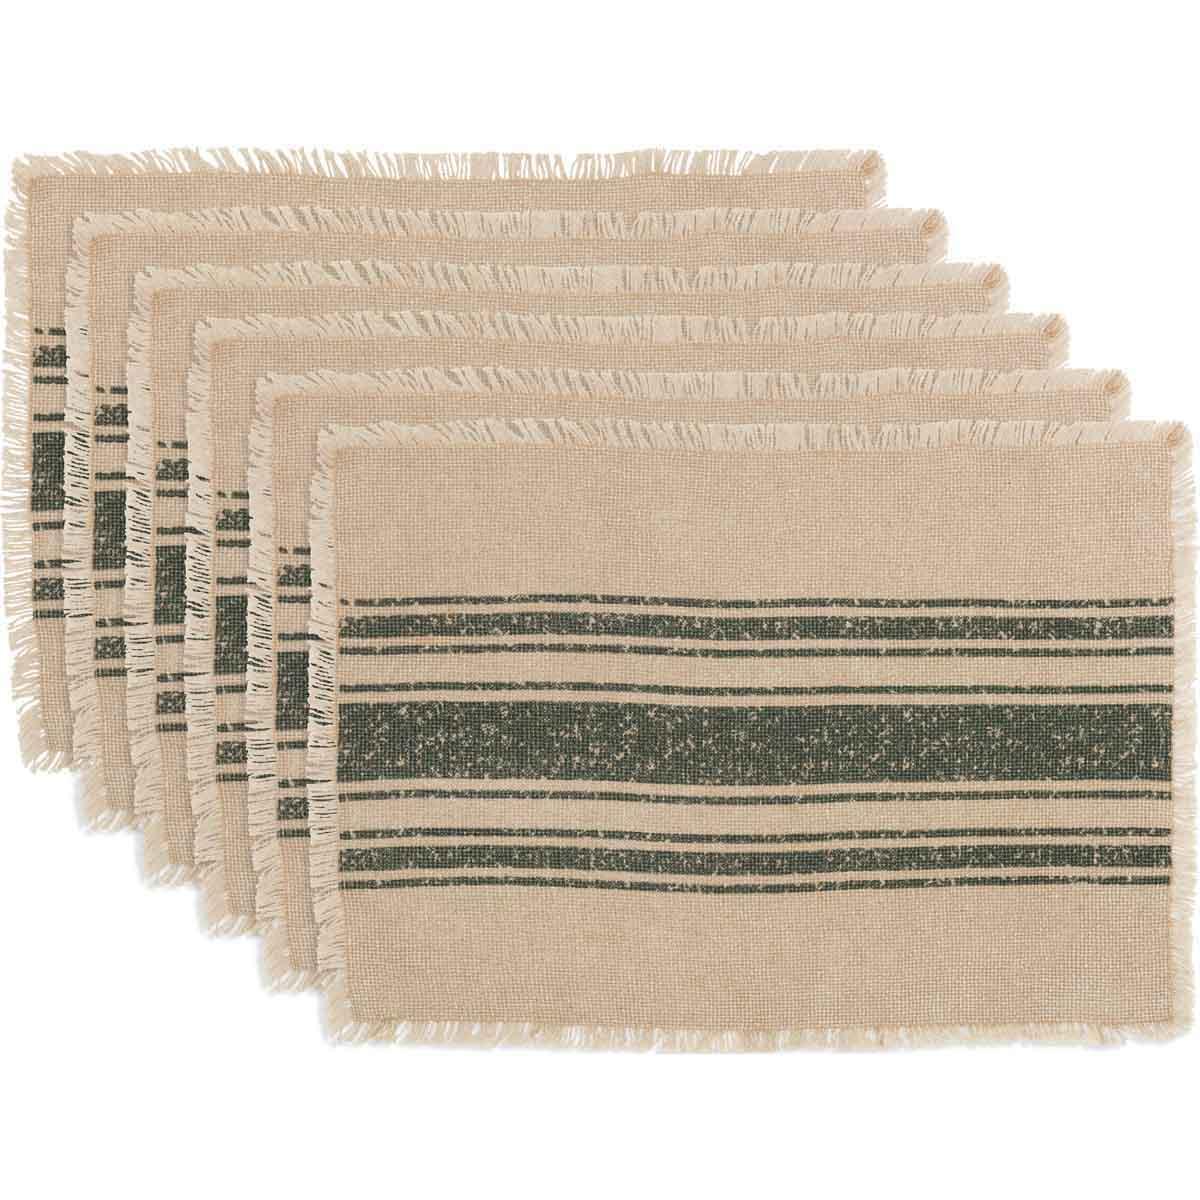 Vintage Burlap Stripe Green Placemat Set of 6 12x18